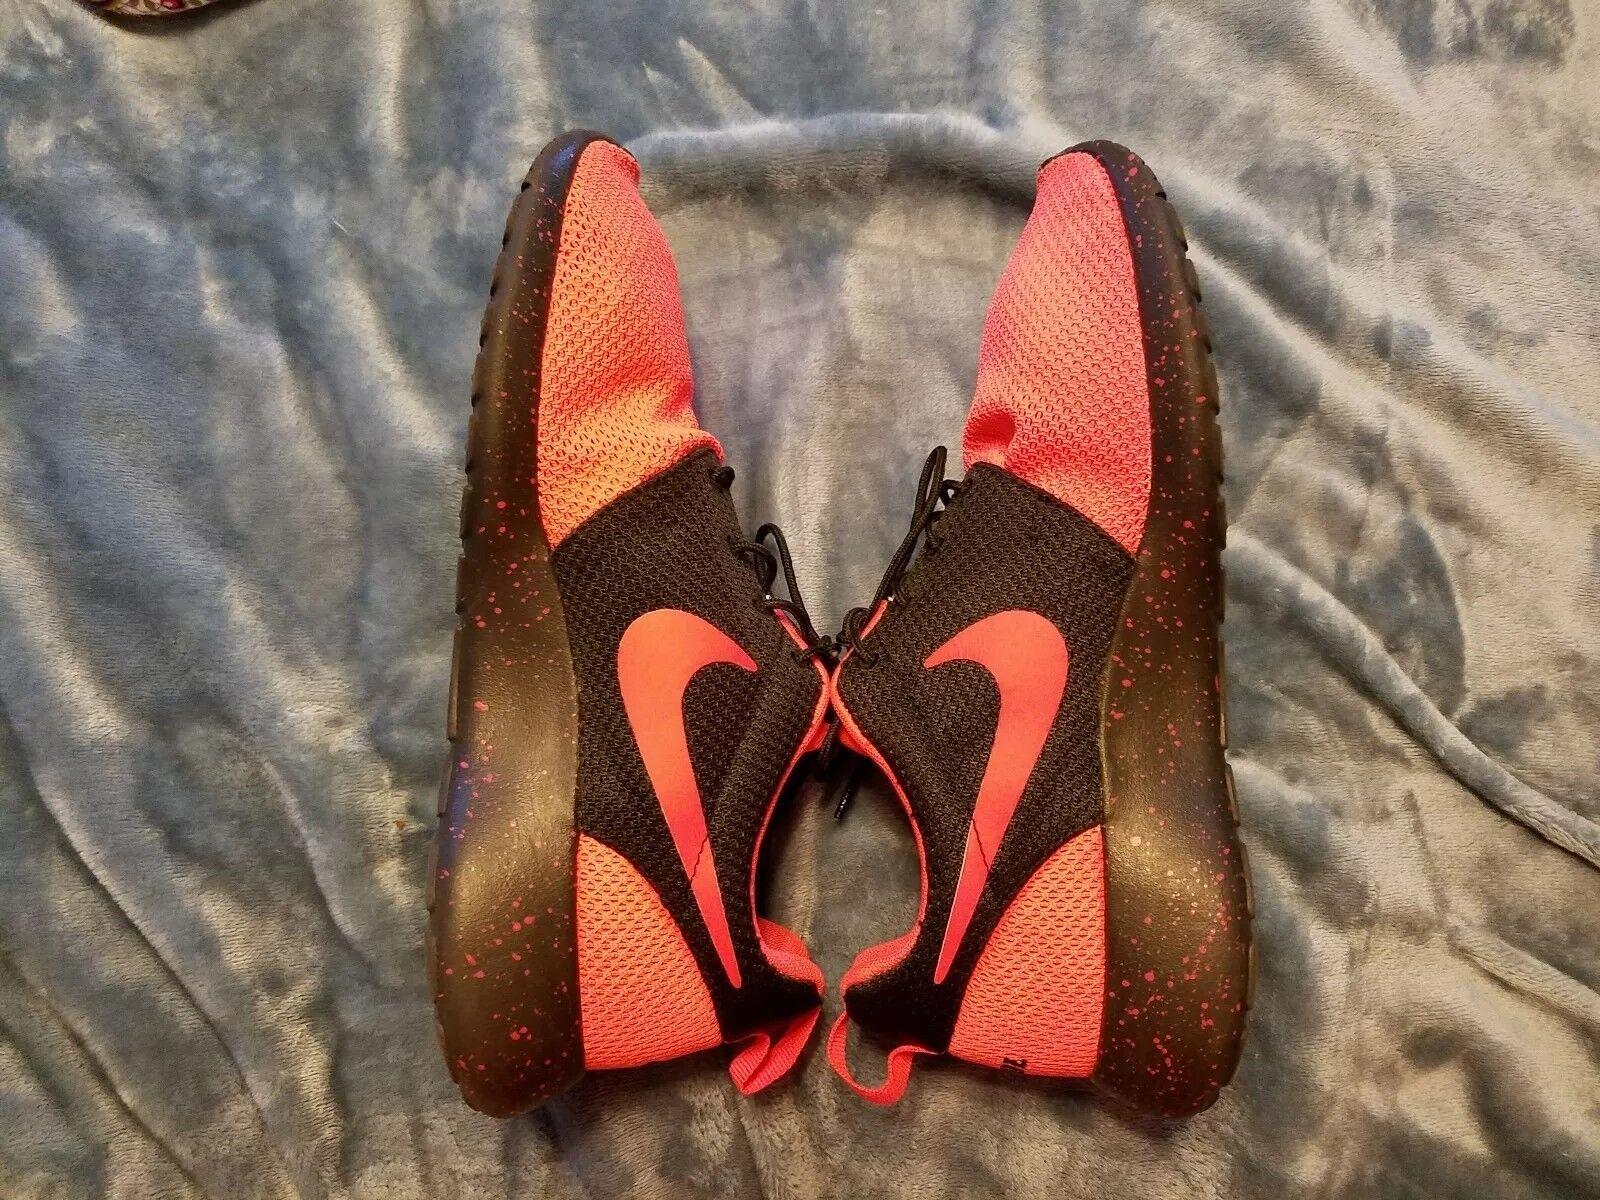 NikeiD Men's Roshe One Athletic Shoe Black/Orange 616834-992 size 8 Comfortable and good-looking